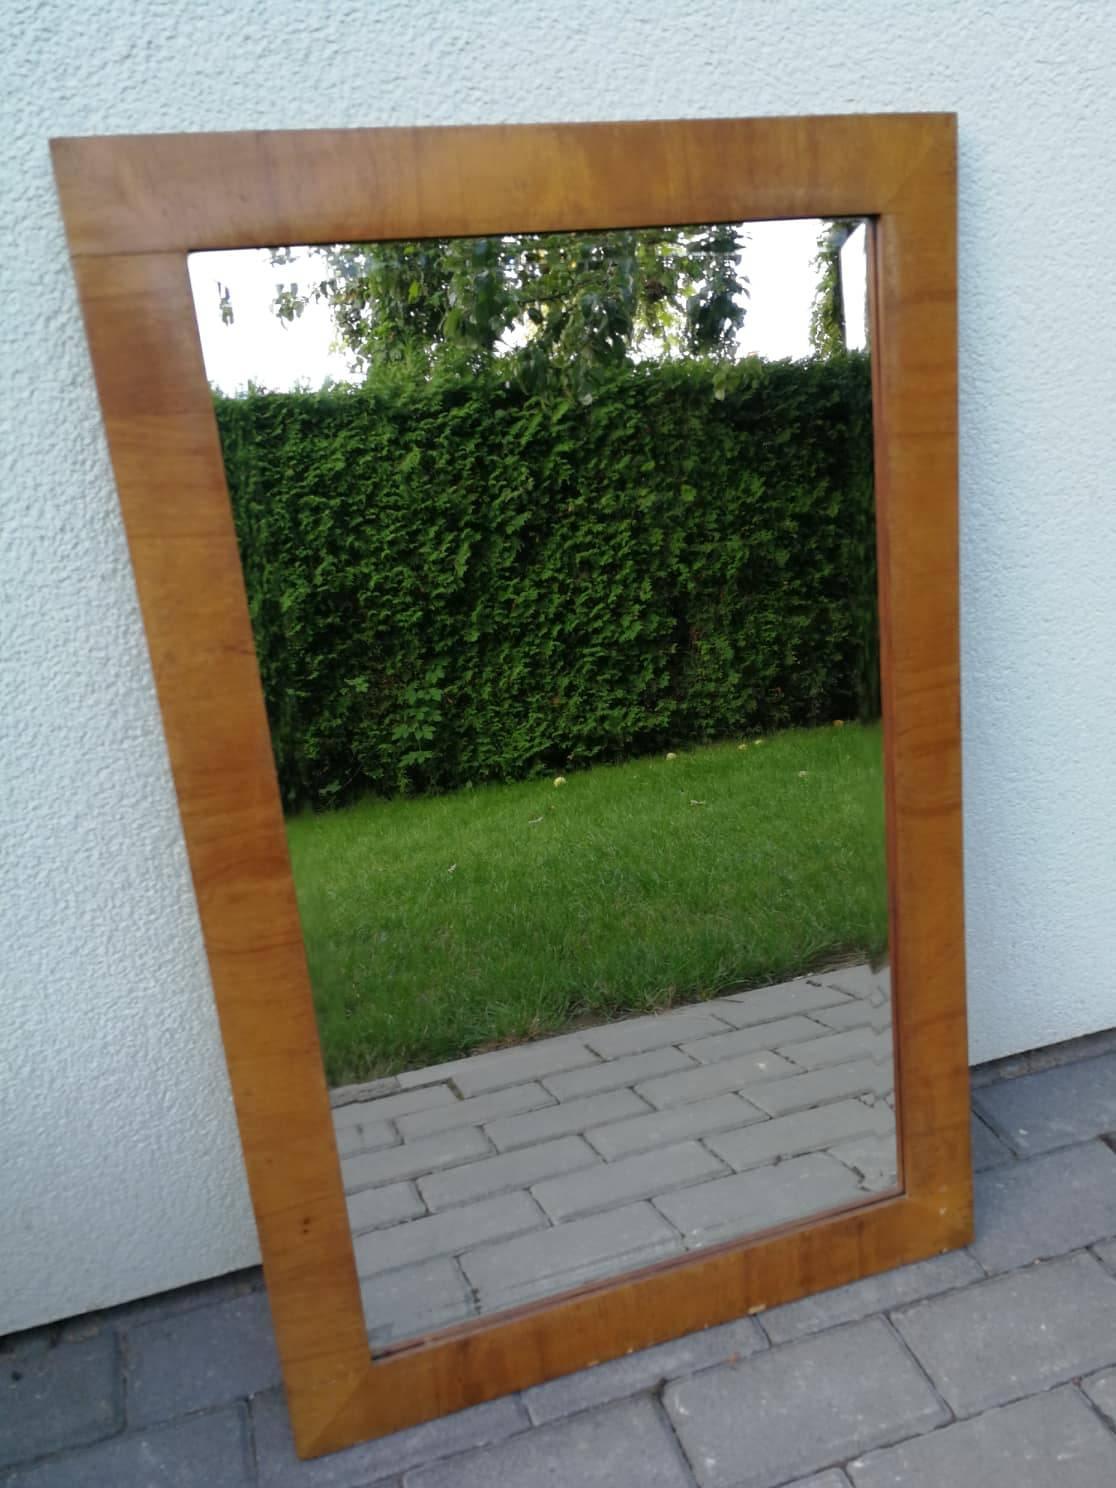 Tarpukario lietuviskas veidrodis facetuotu stiklu. Kaina 18